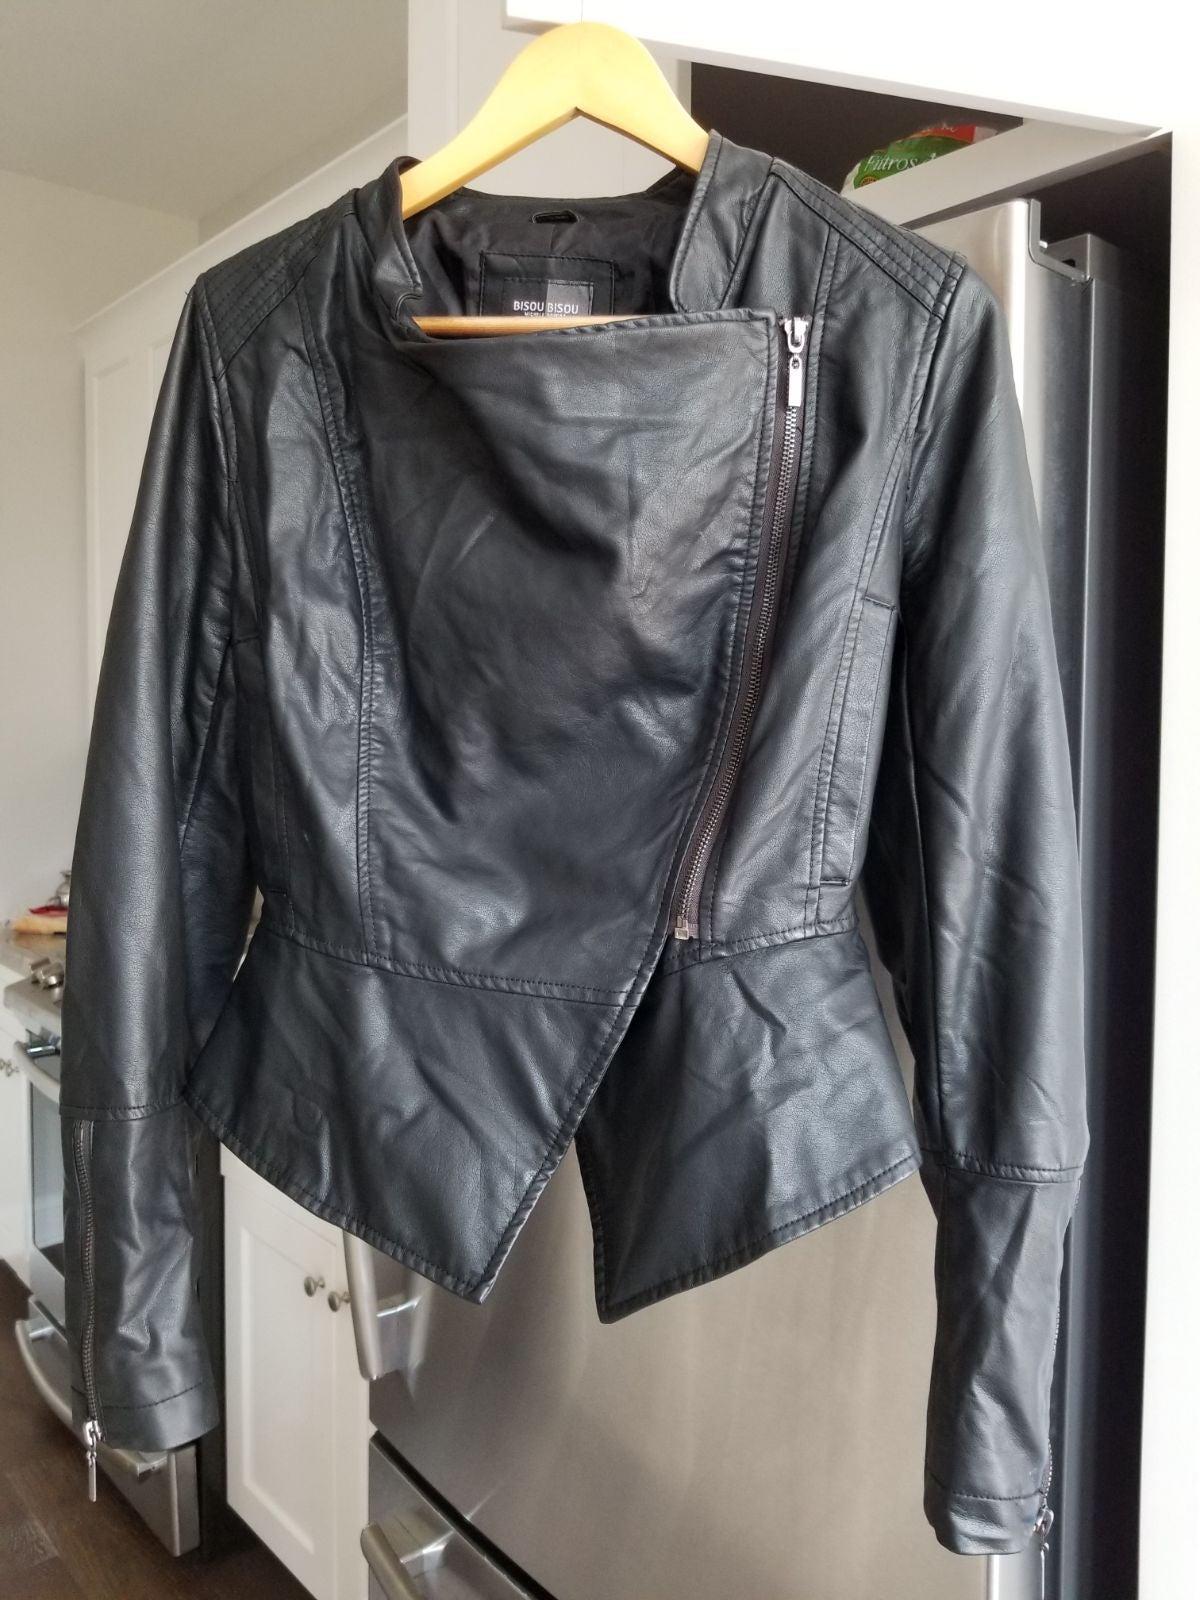 BISOU BISOU Faux Leather Jacket